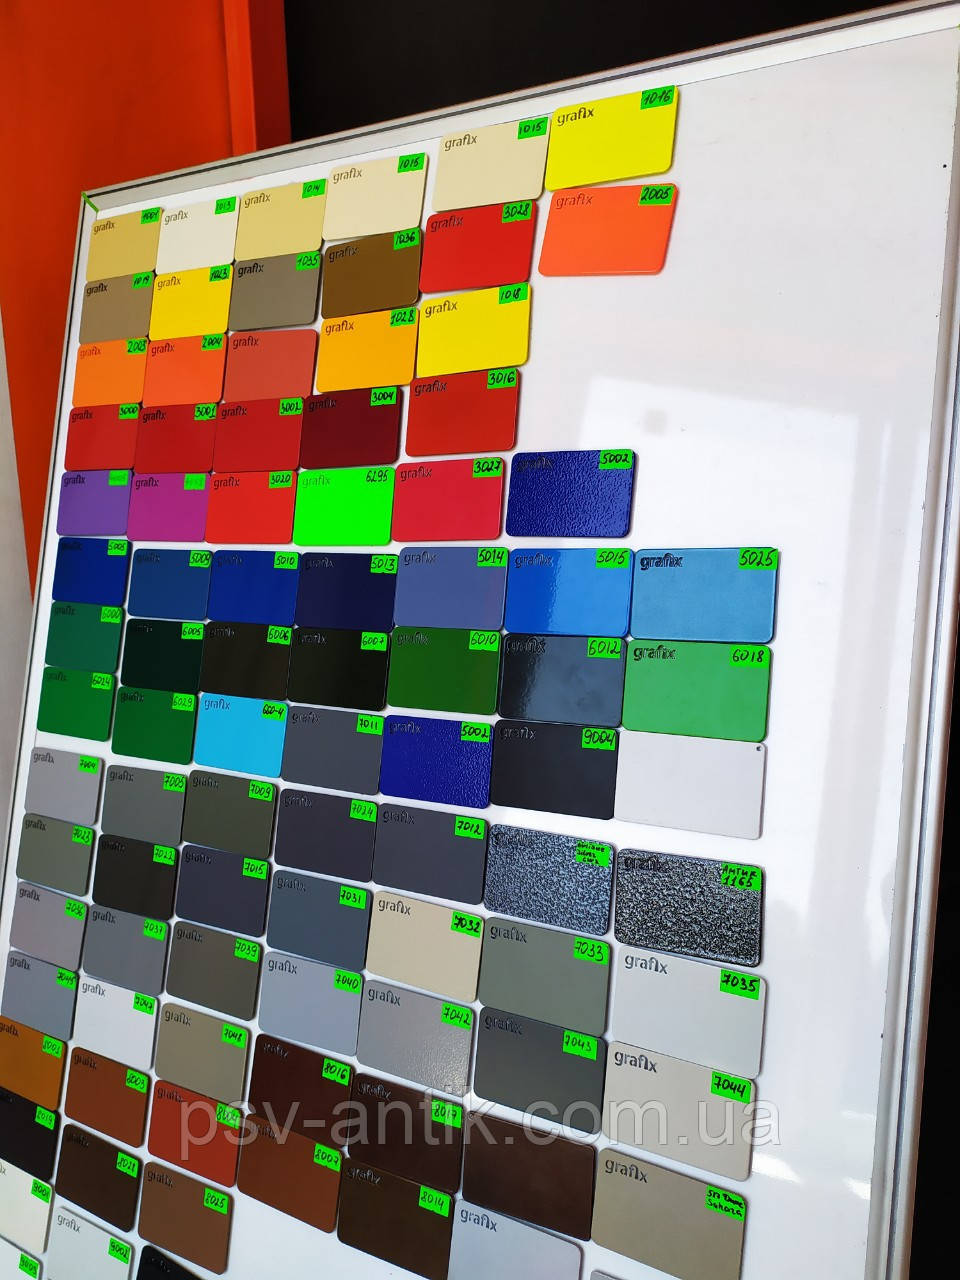 Порошковая краска глянцевая, полиэфирная, архитектурная, 5023